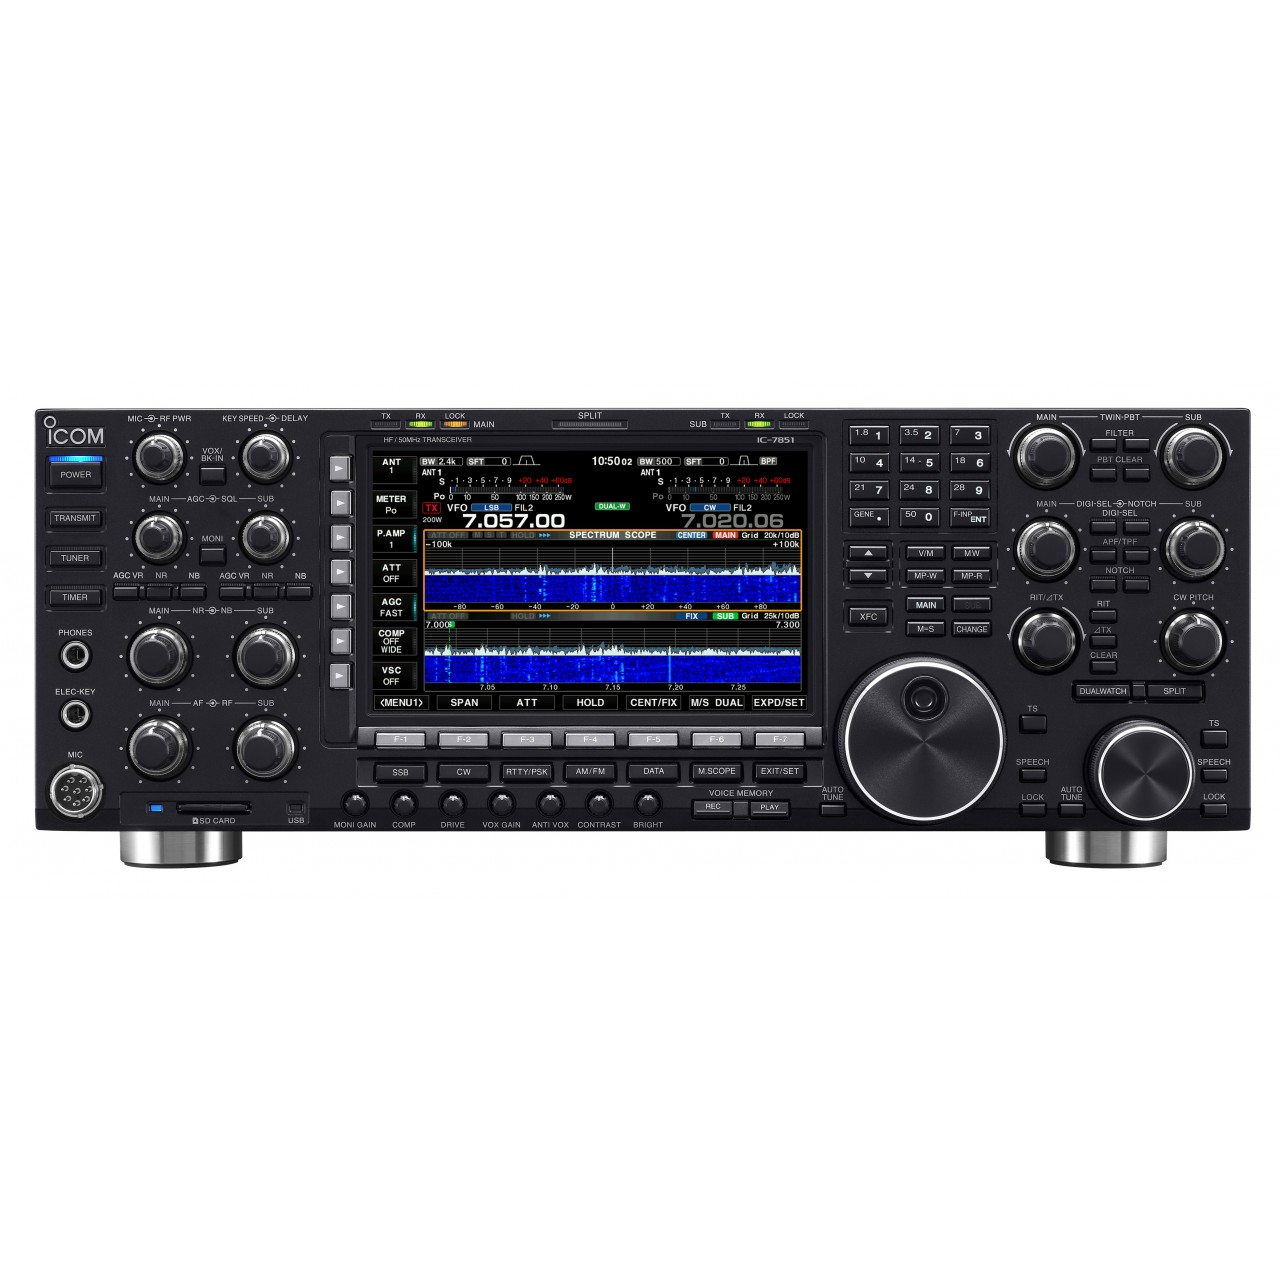 IC-7851 Fixed stations / HF - ICOM